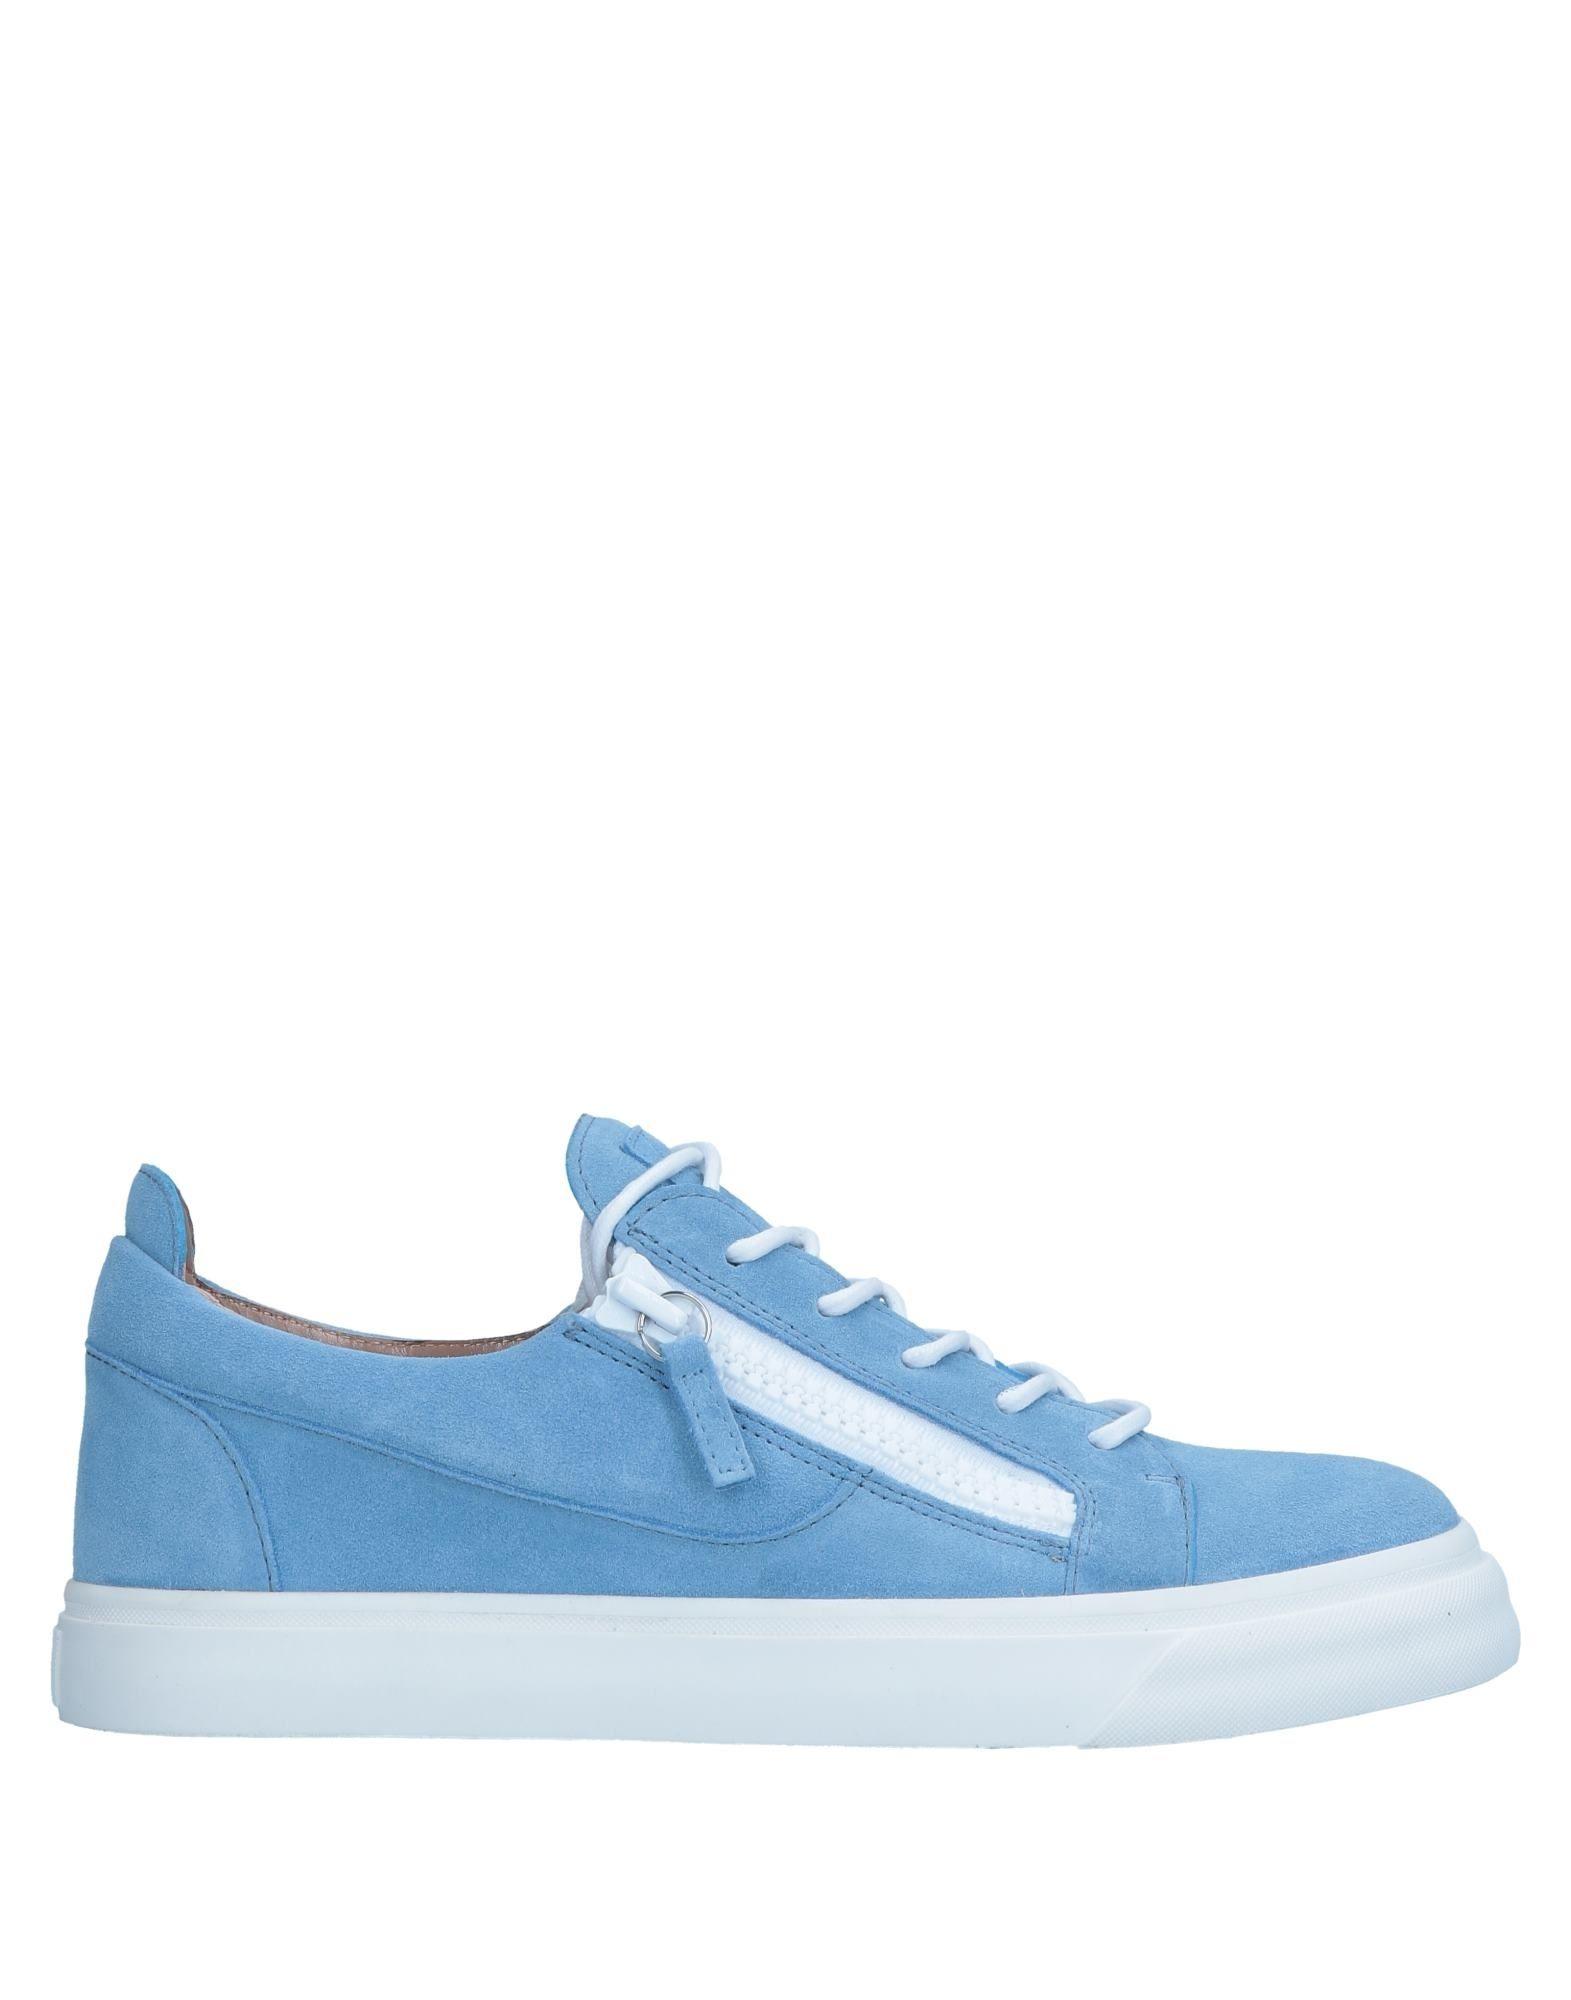 Sneakers Giuseppe Zanotti Homme - Sneakers Giuseppe Zanotti  Bleu ciel Remise de marque